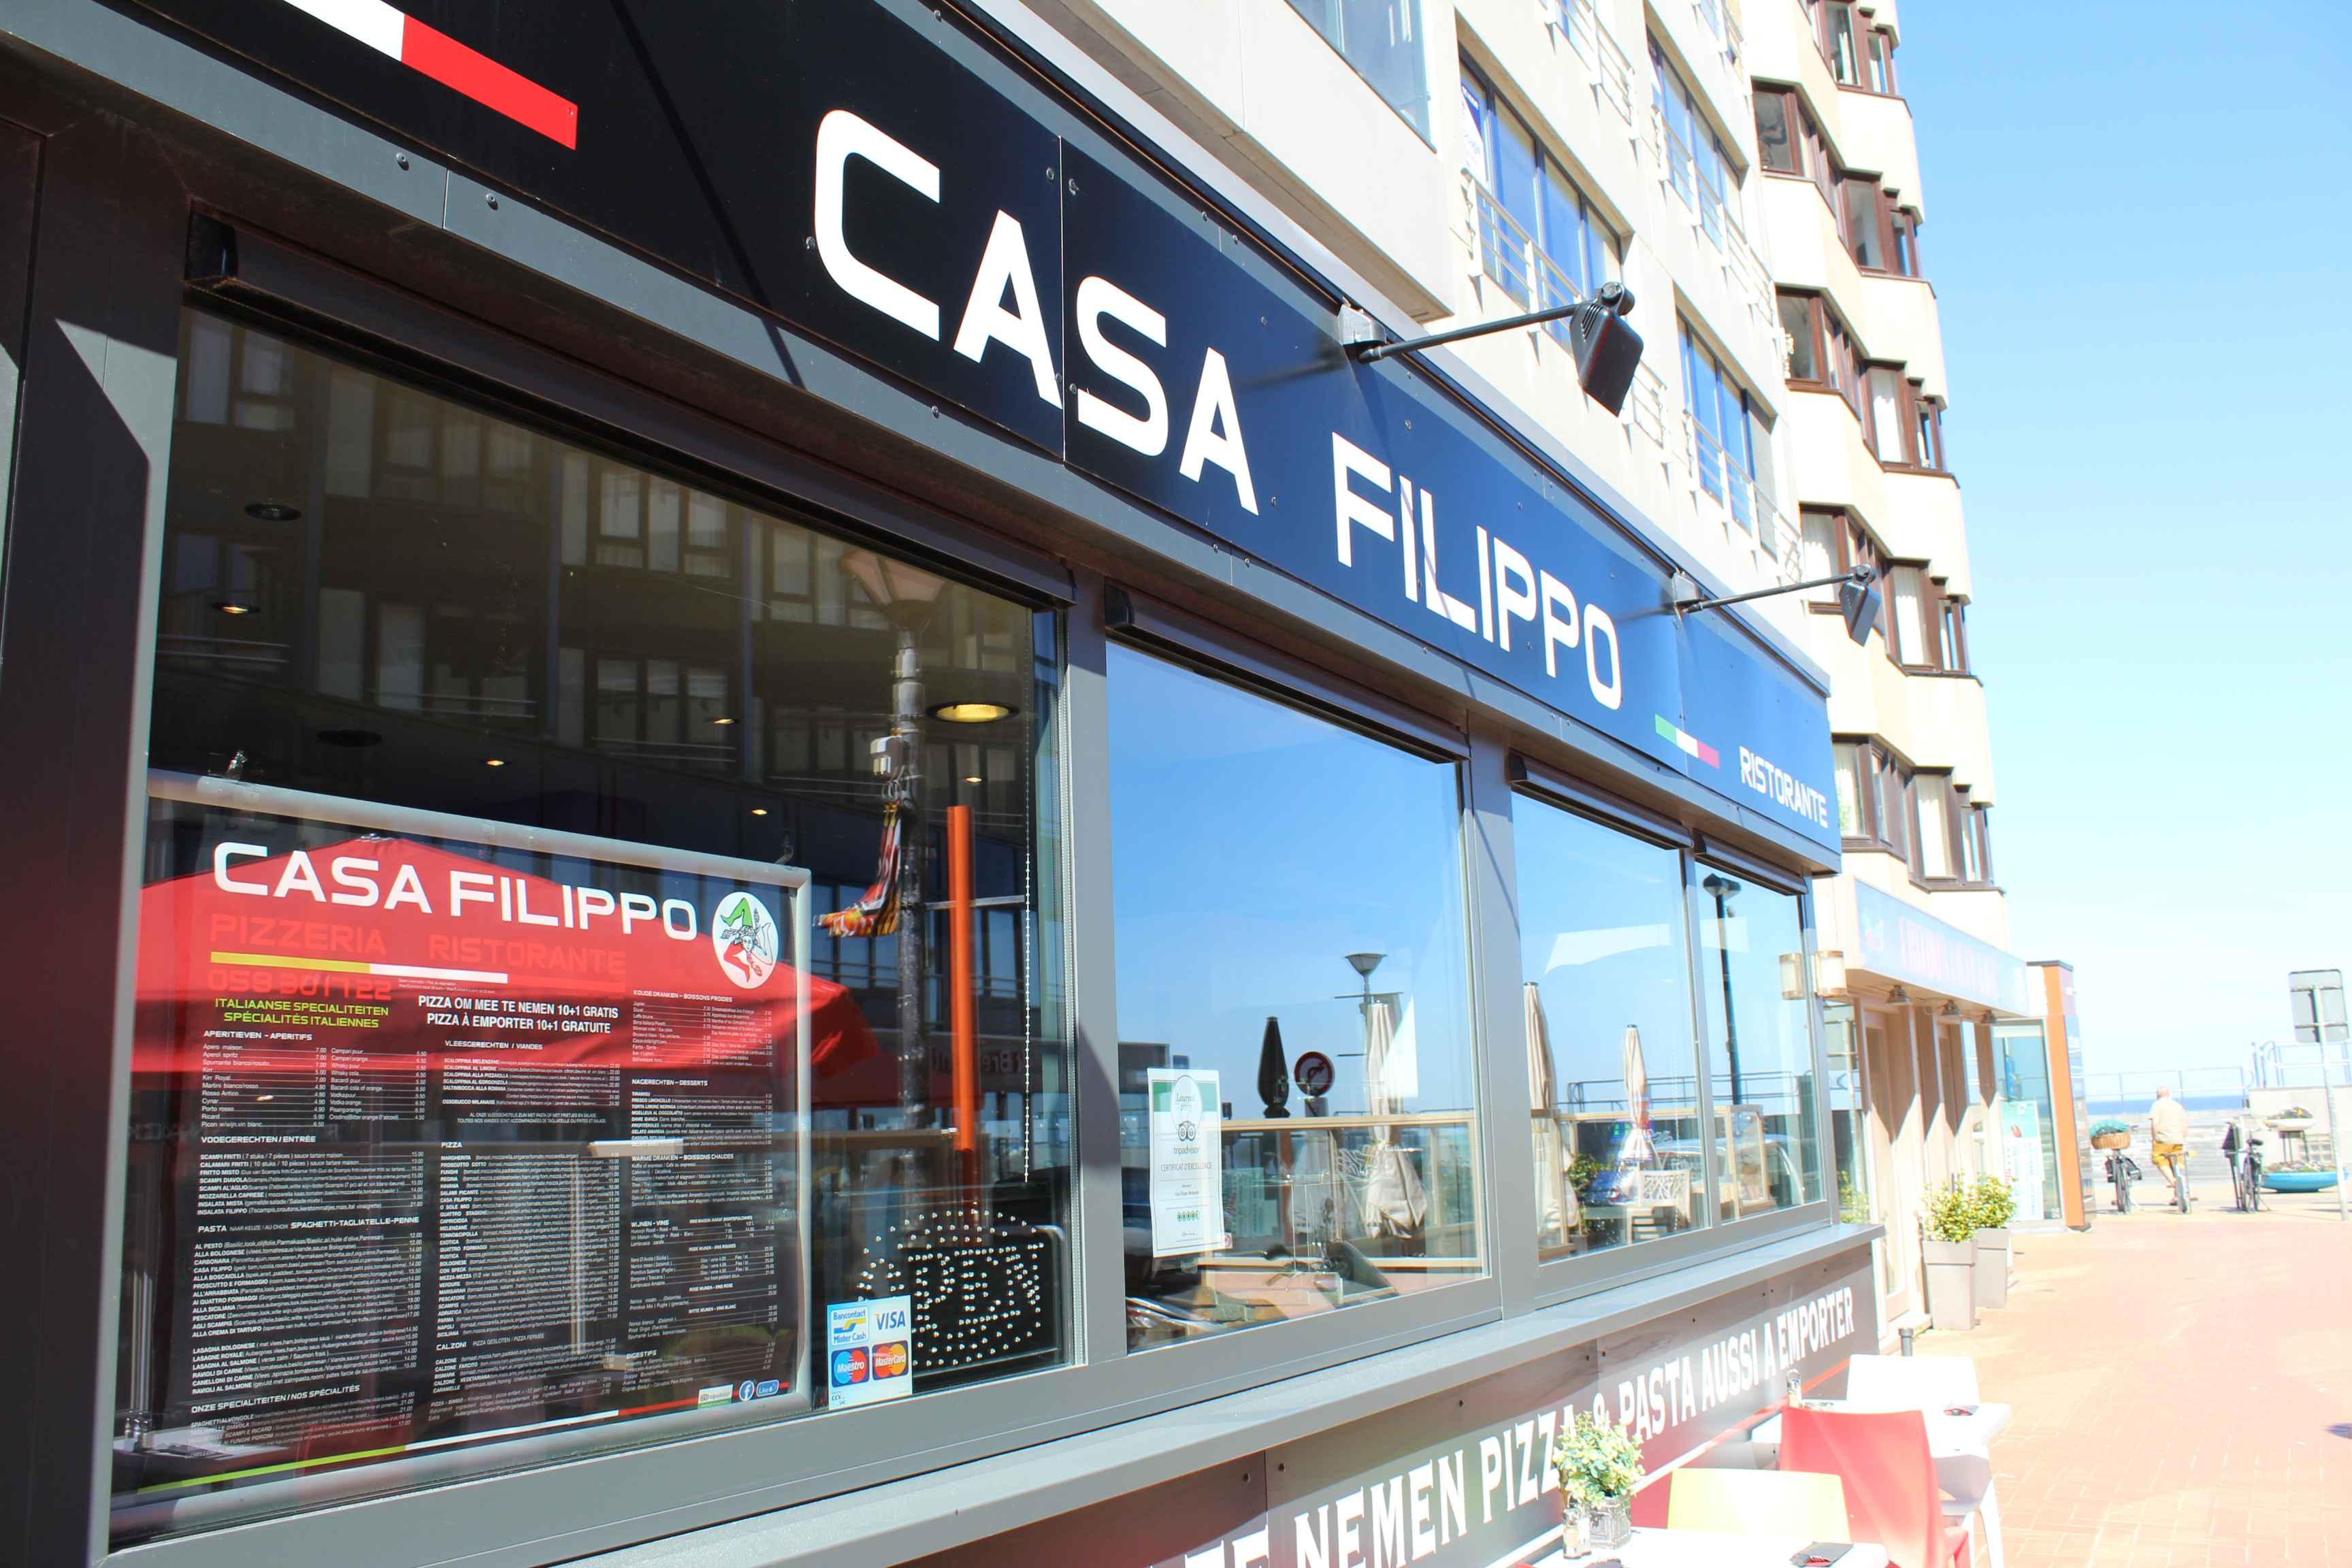 Ristorante Pizzeria Casa Filippo Westende - Middelkerke - Meeuwenlaan